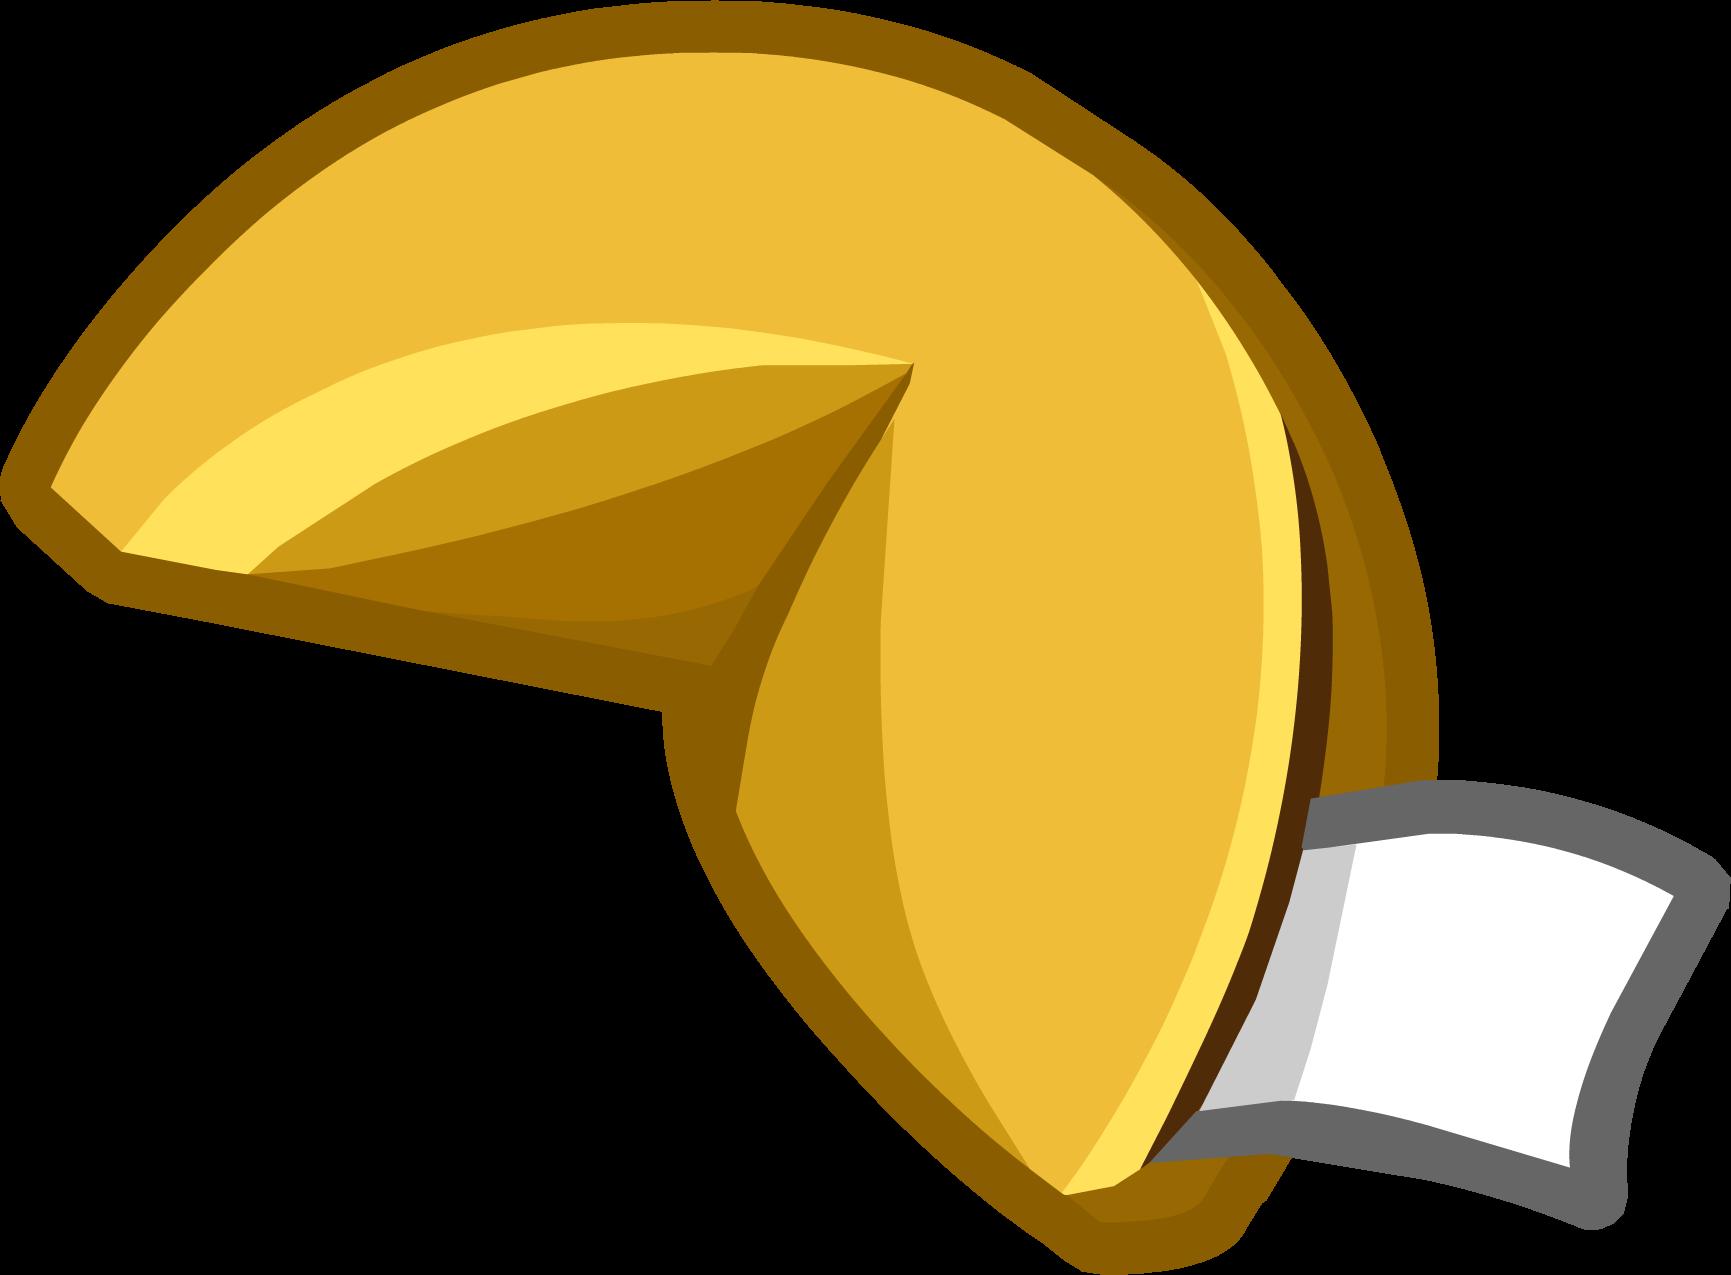 Keyhole essay introduction